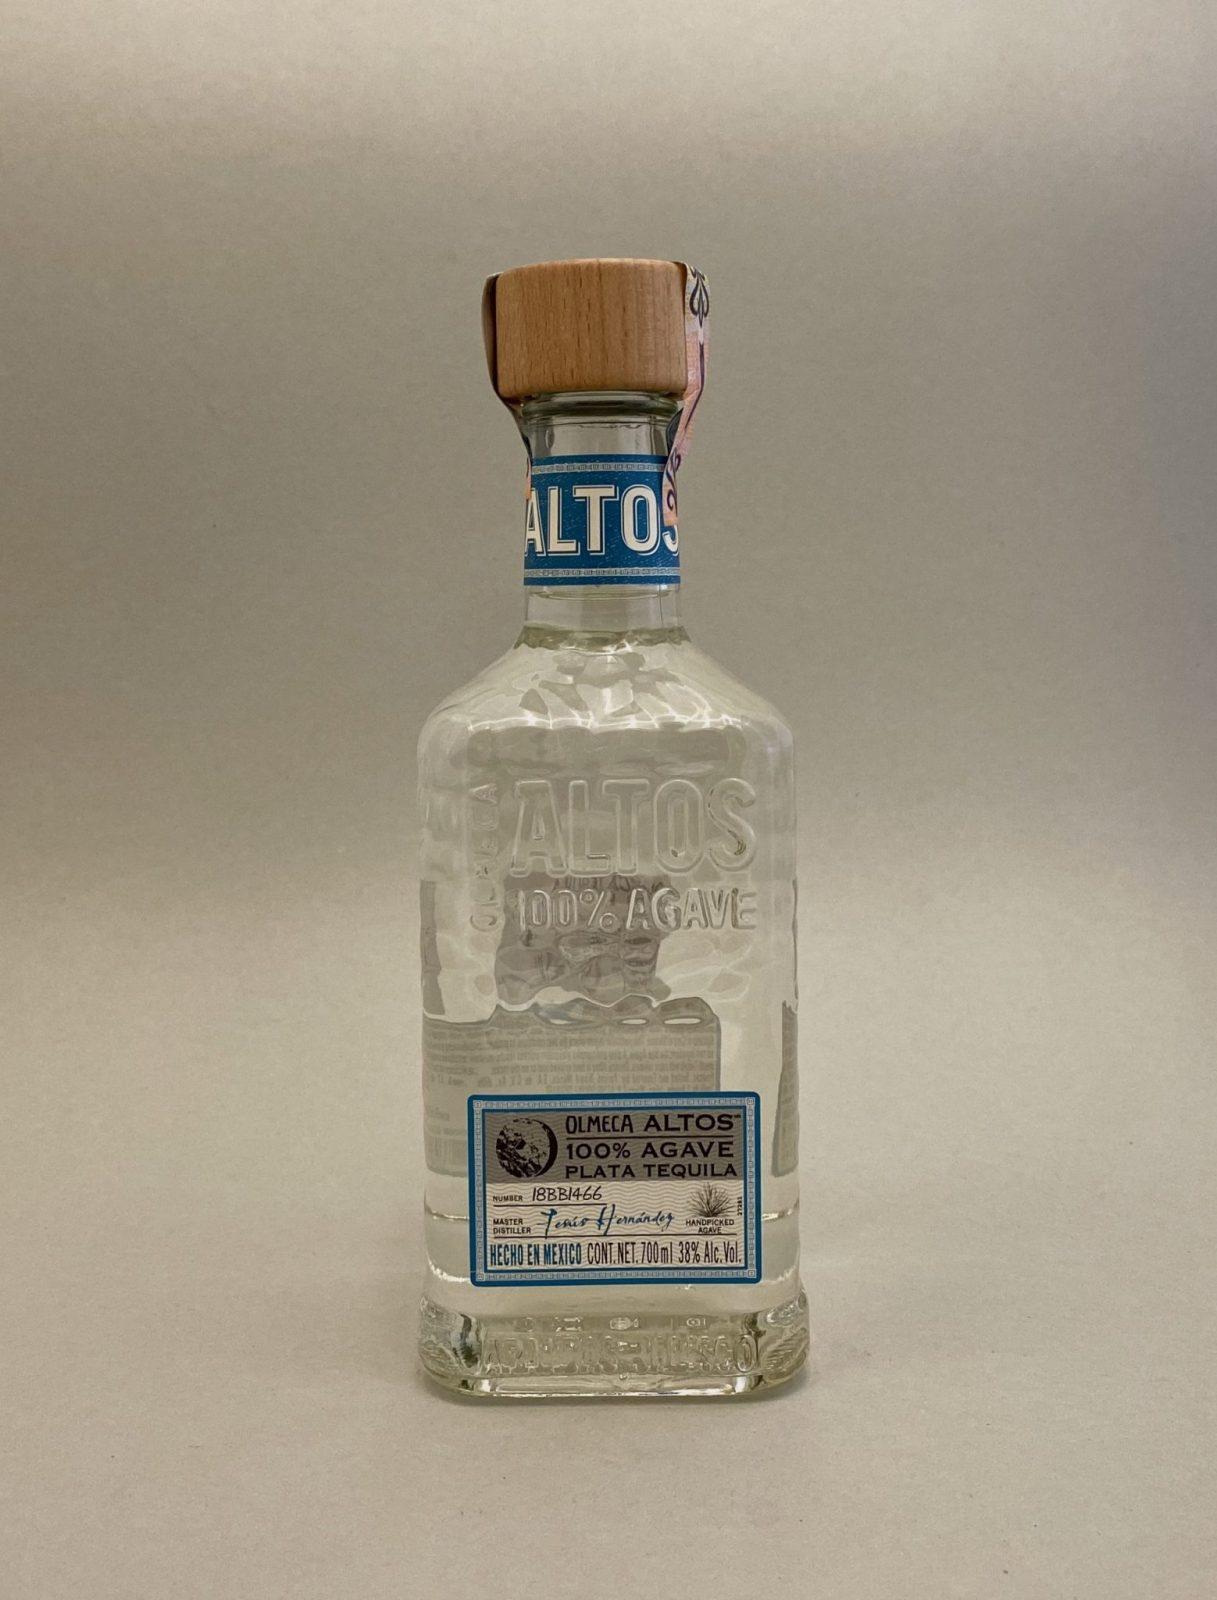 Olmeca Altos Plata 38%, Bottleshop Sunny wines slnecnice mesto, petrzalka, Tequila, rozvoz alkoholu, eshop